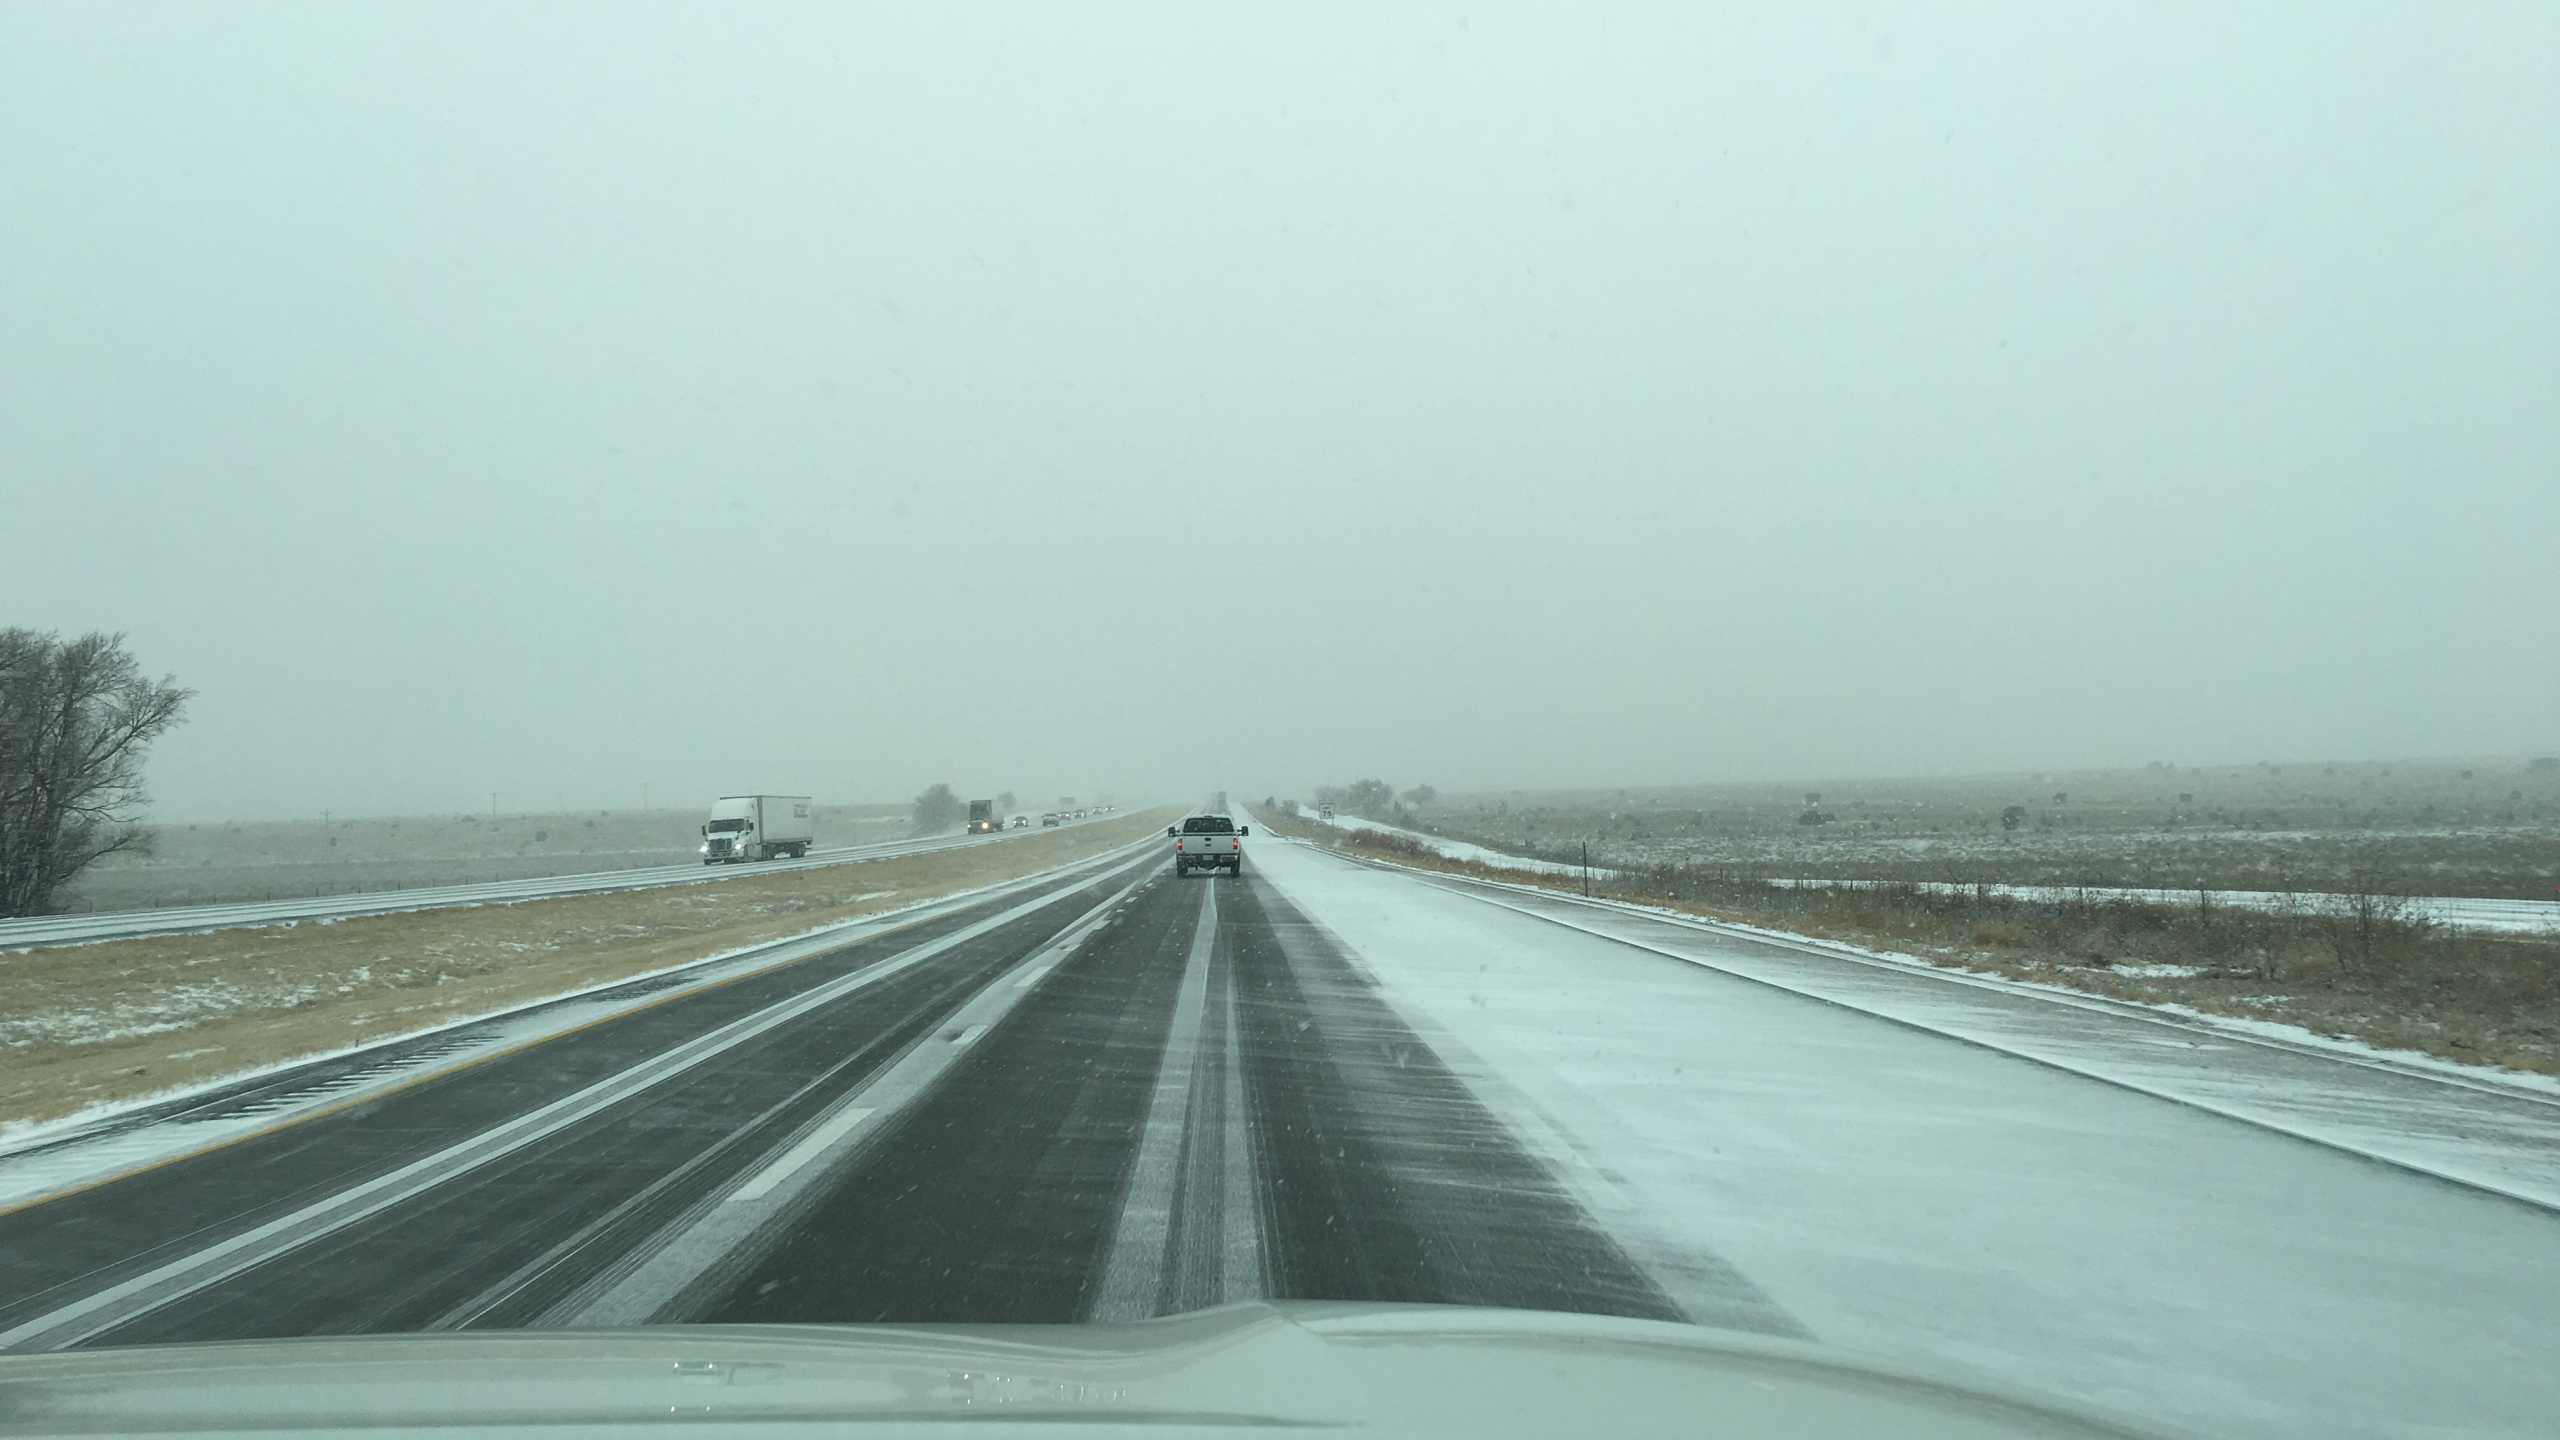 blizzard road 12-26-15_1451193979537.JPG